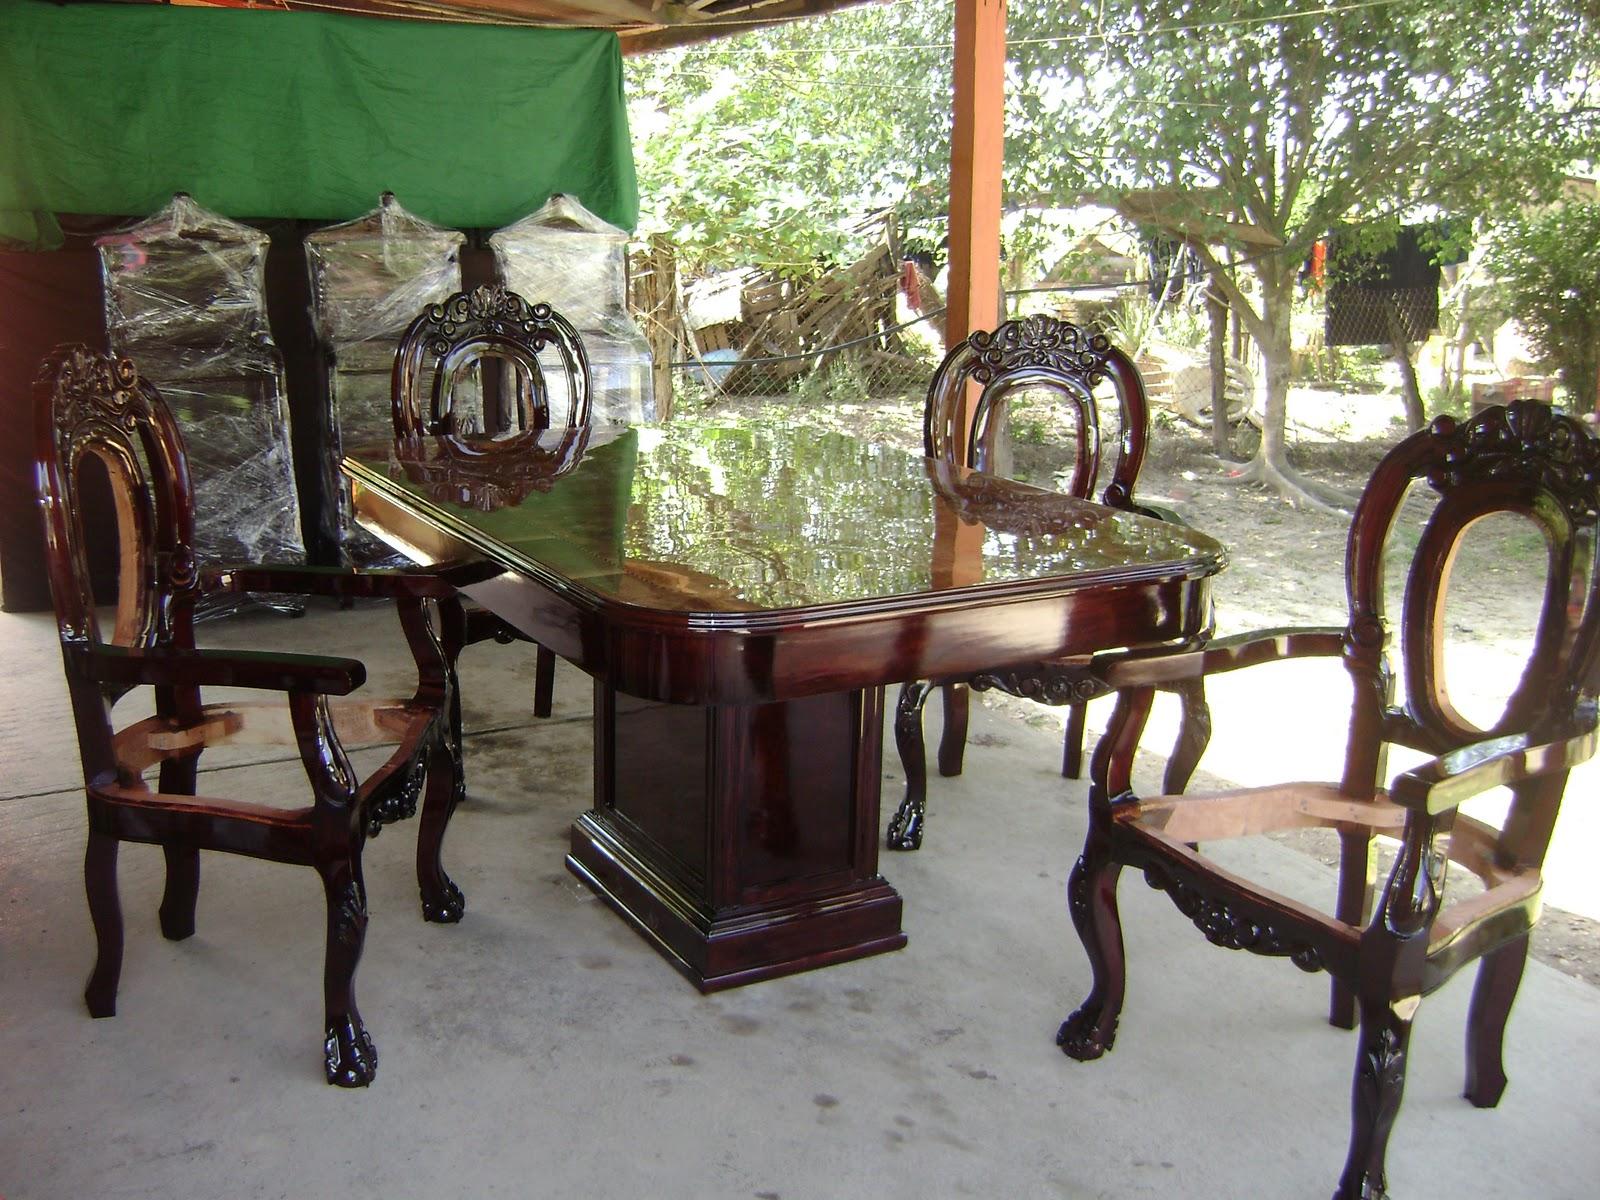 Muebles Tihuatlan - Disenos En Madera[mjhdah]https://farm3.static.flickr.com/2010/2376242055_ed80c4e751_b.jpg